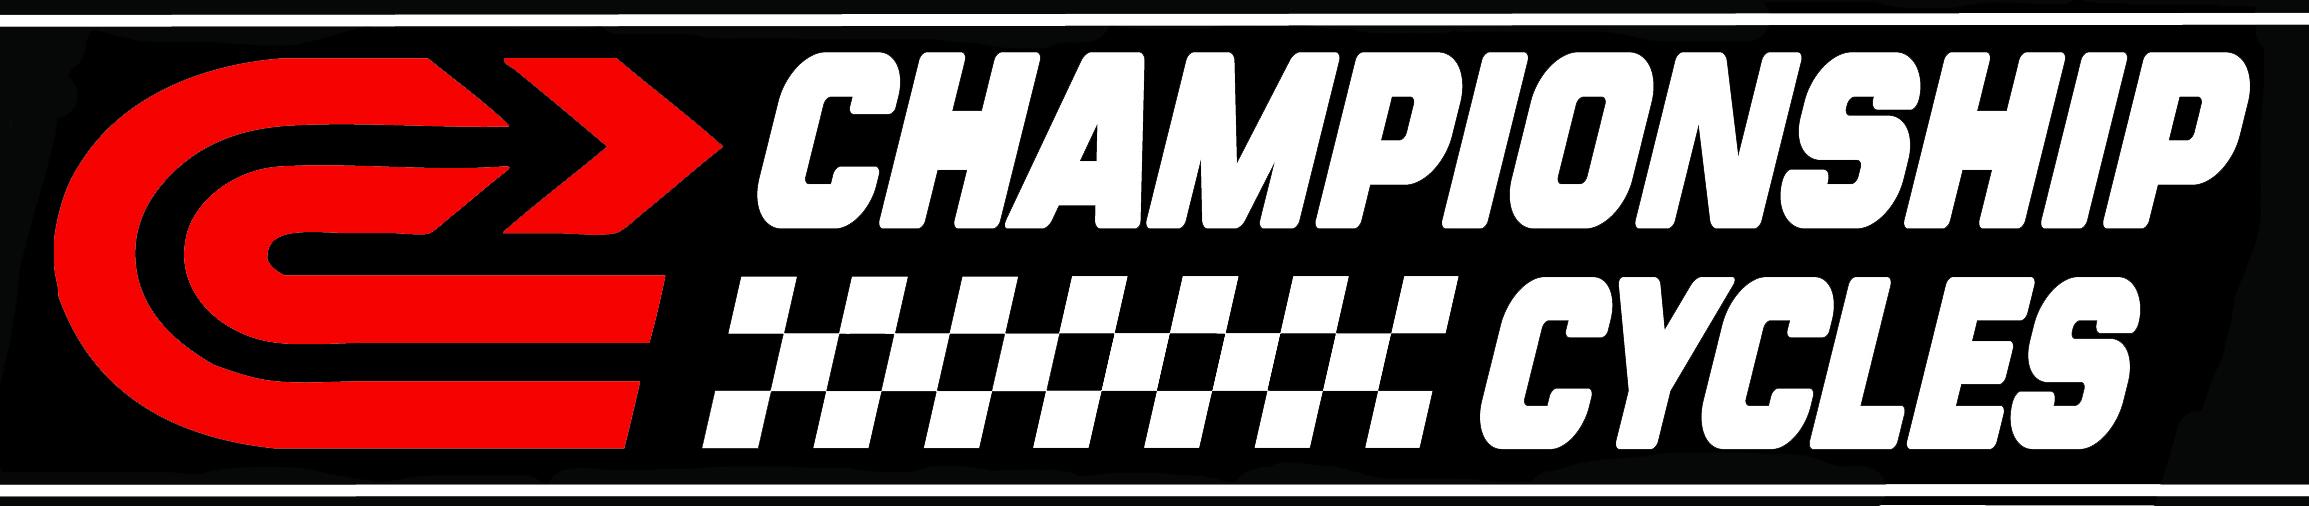 Championship Cycles